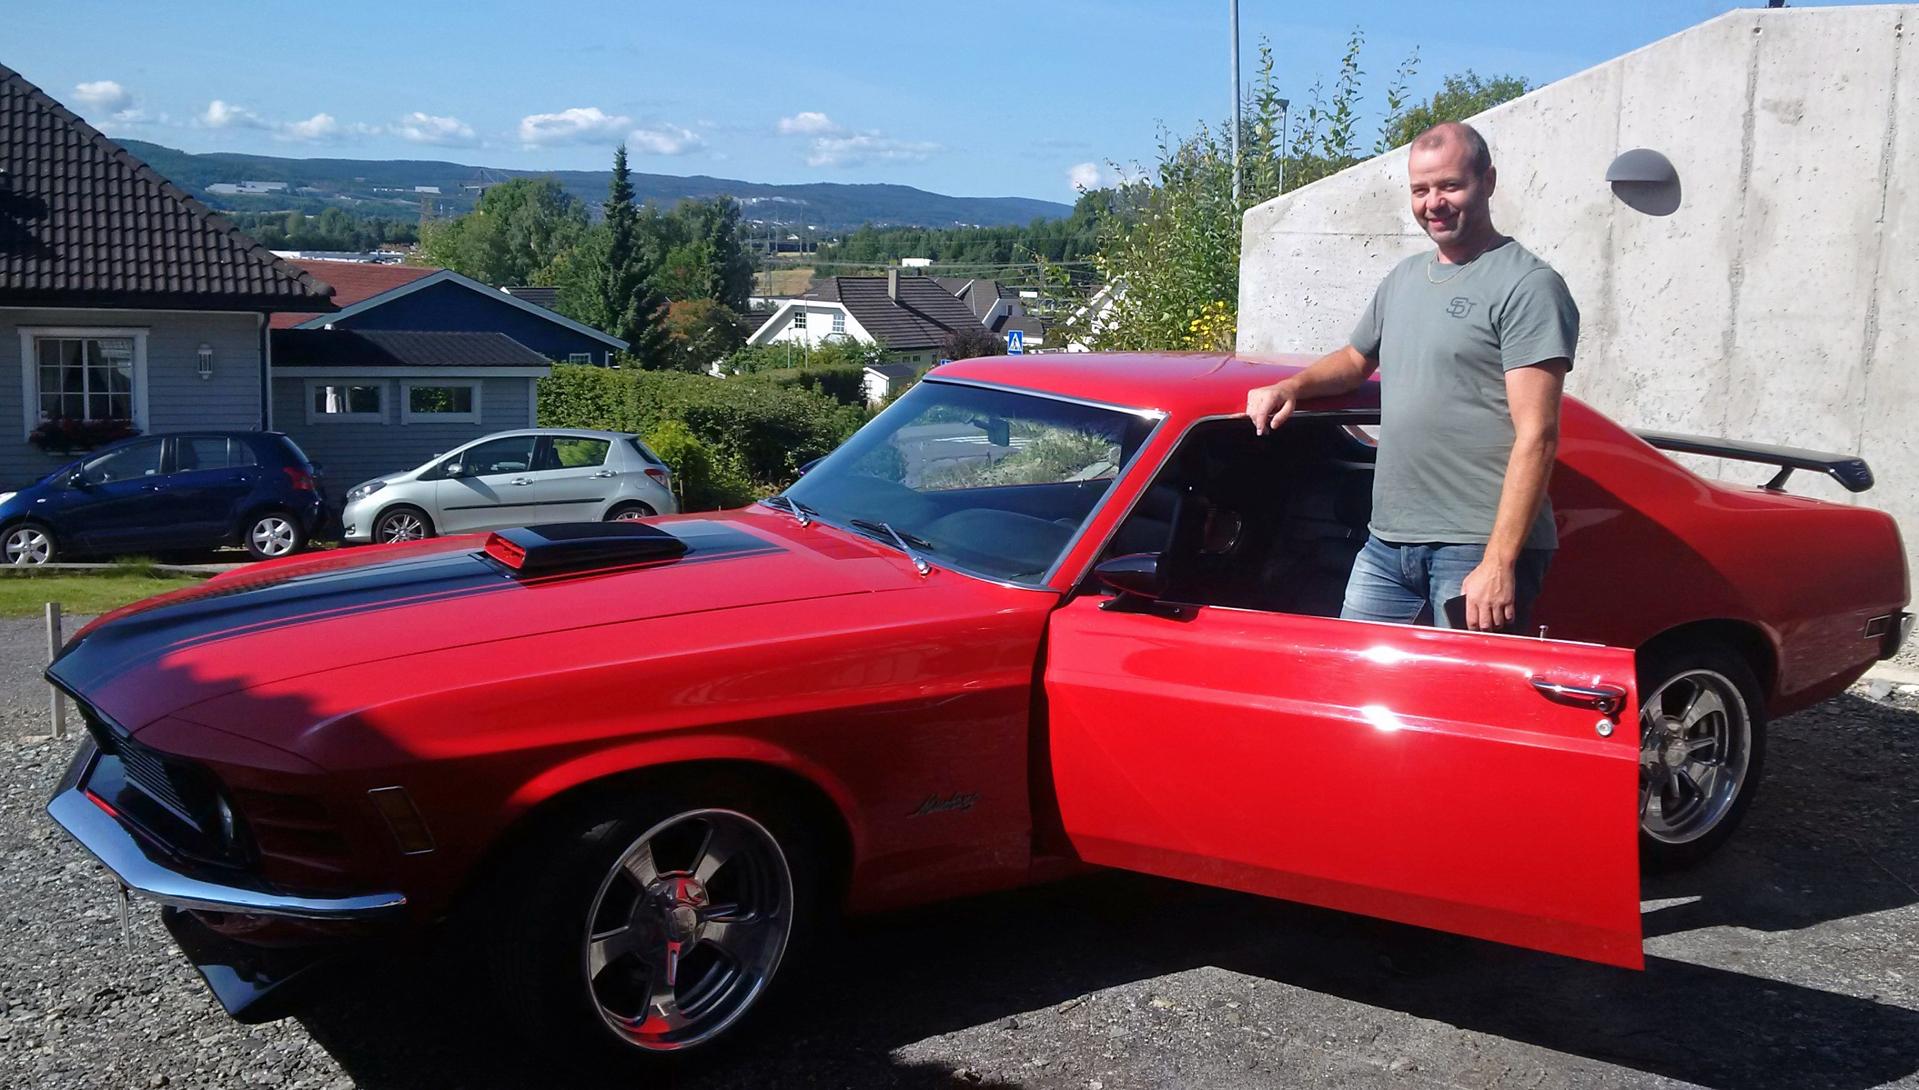 269-1970 Ford Mustang Hardtop 03. Eier- medlem 269